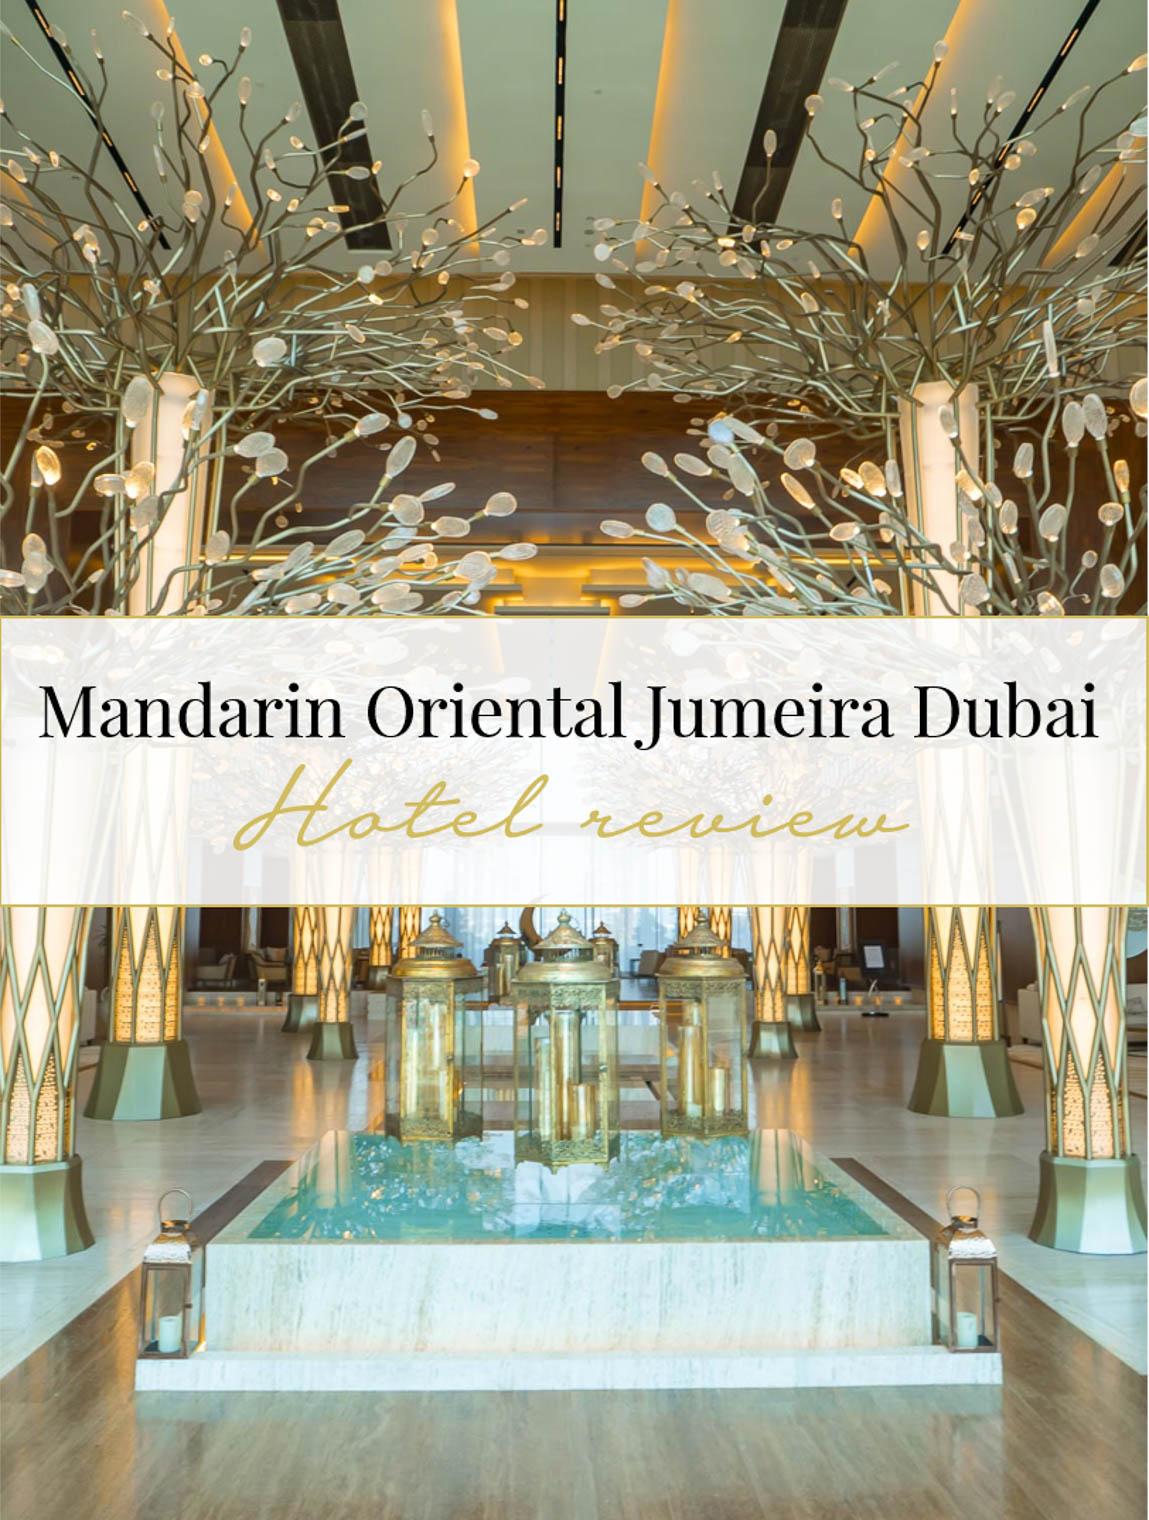 Hotel review Mandarin Oriental Jumeira Dubai